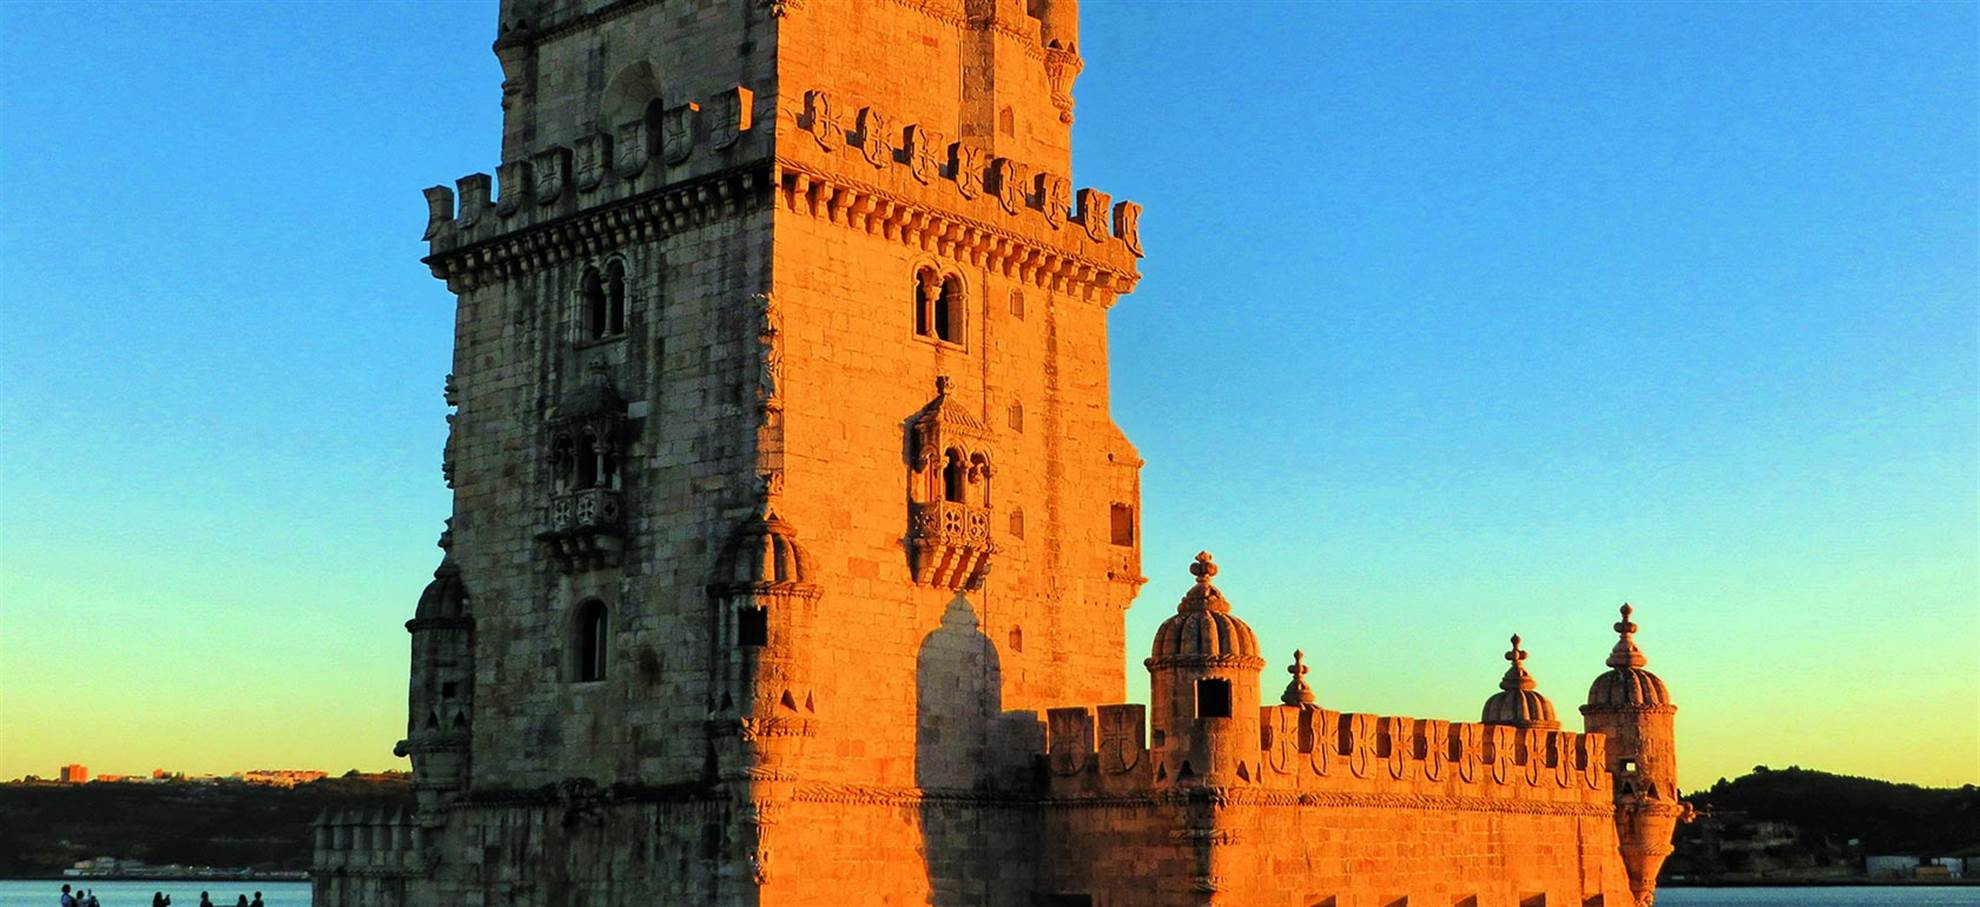 Torre de Belém - Skip the line tickets